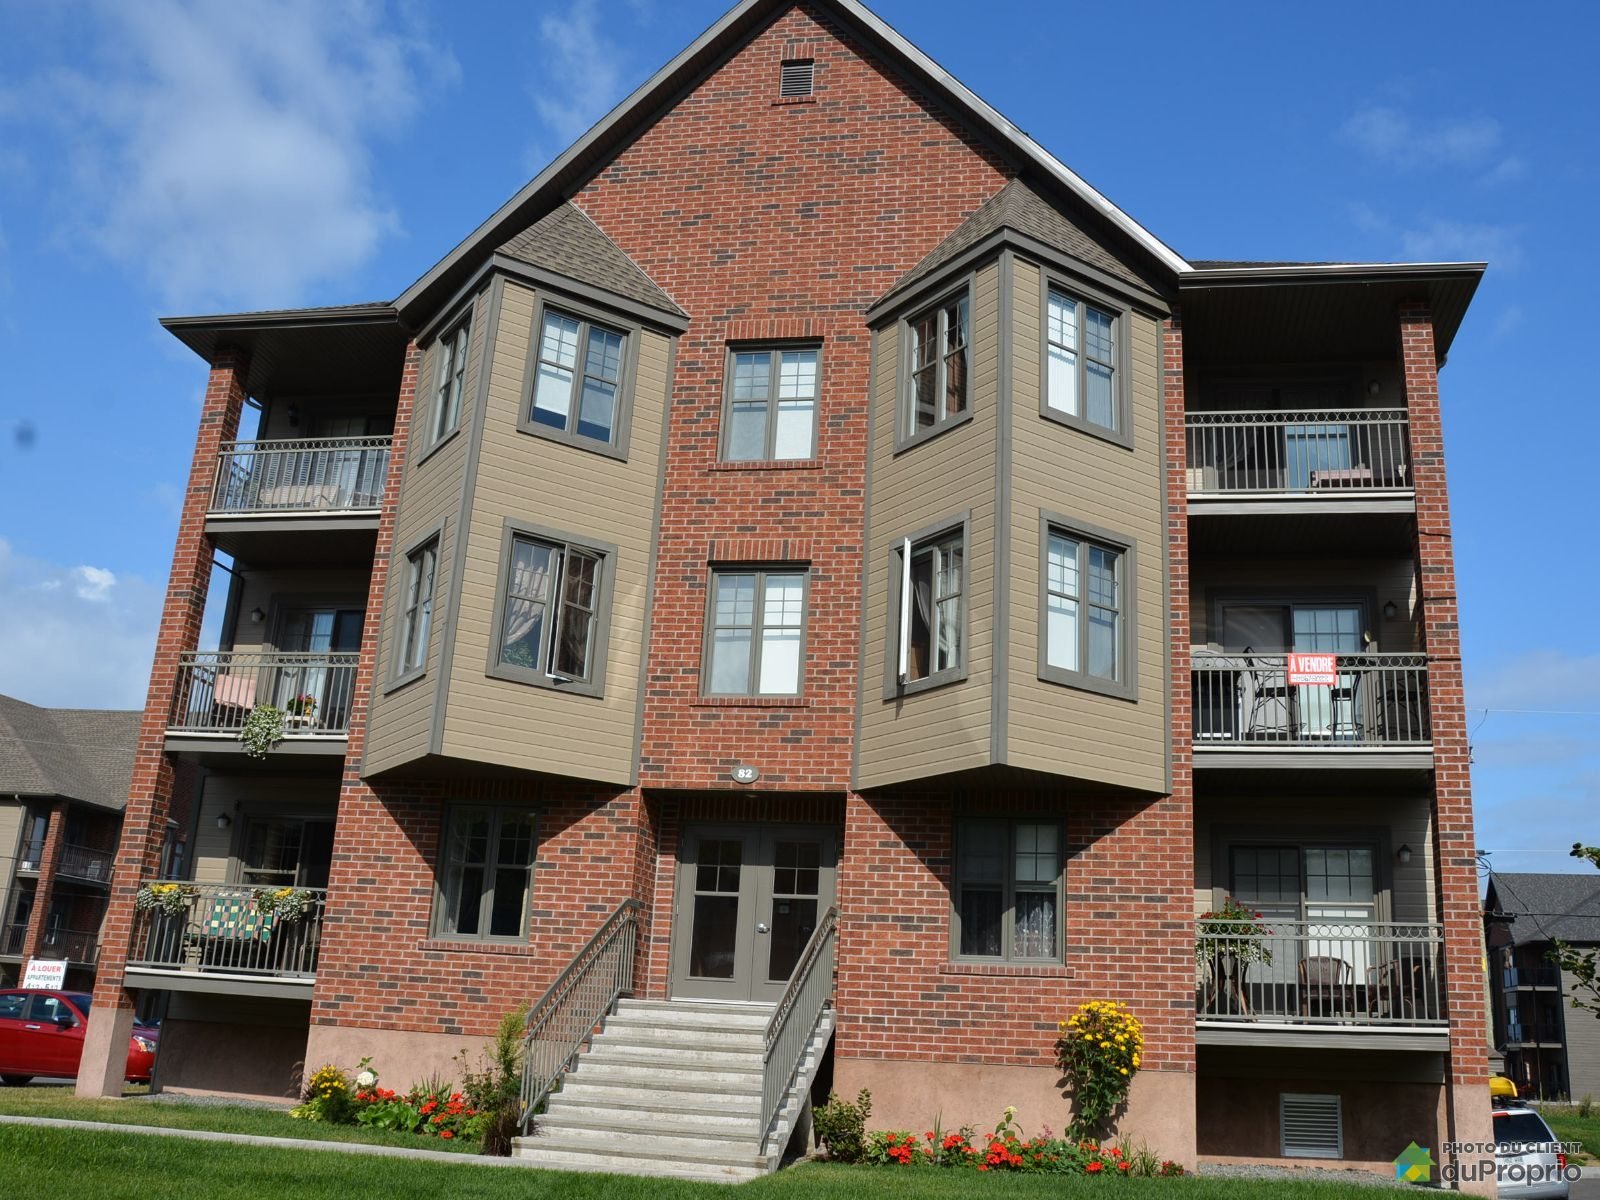 condo vendre rivi re du loup 4 82 rue des jonquilles immobilier qu bec duproprio 647928. Black Bedroom Furniture Sets. Home Design Ideas